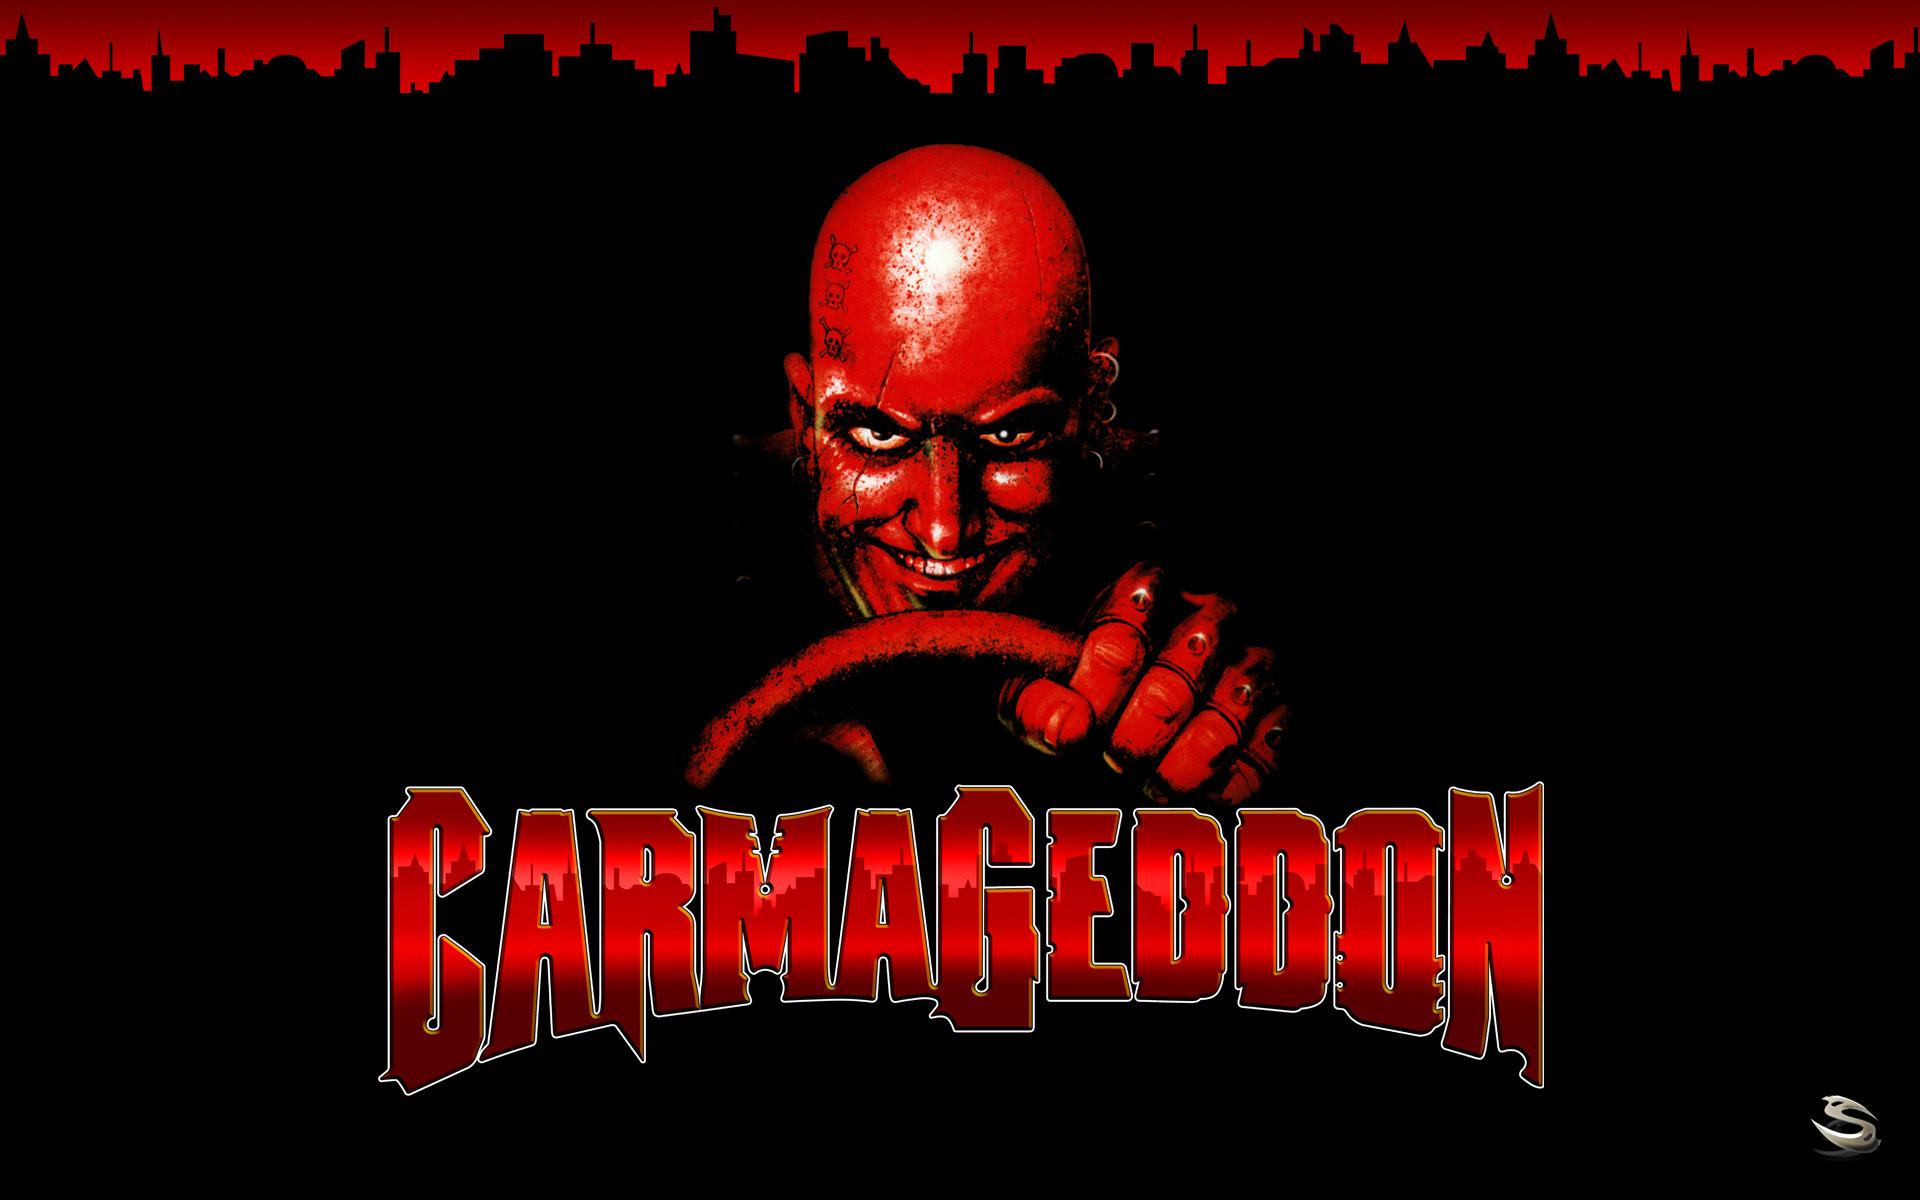 Carmageddon HD Wallpaper Background Image 1920x1200 ID 1920x1200